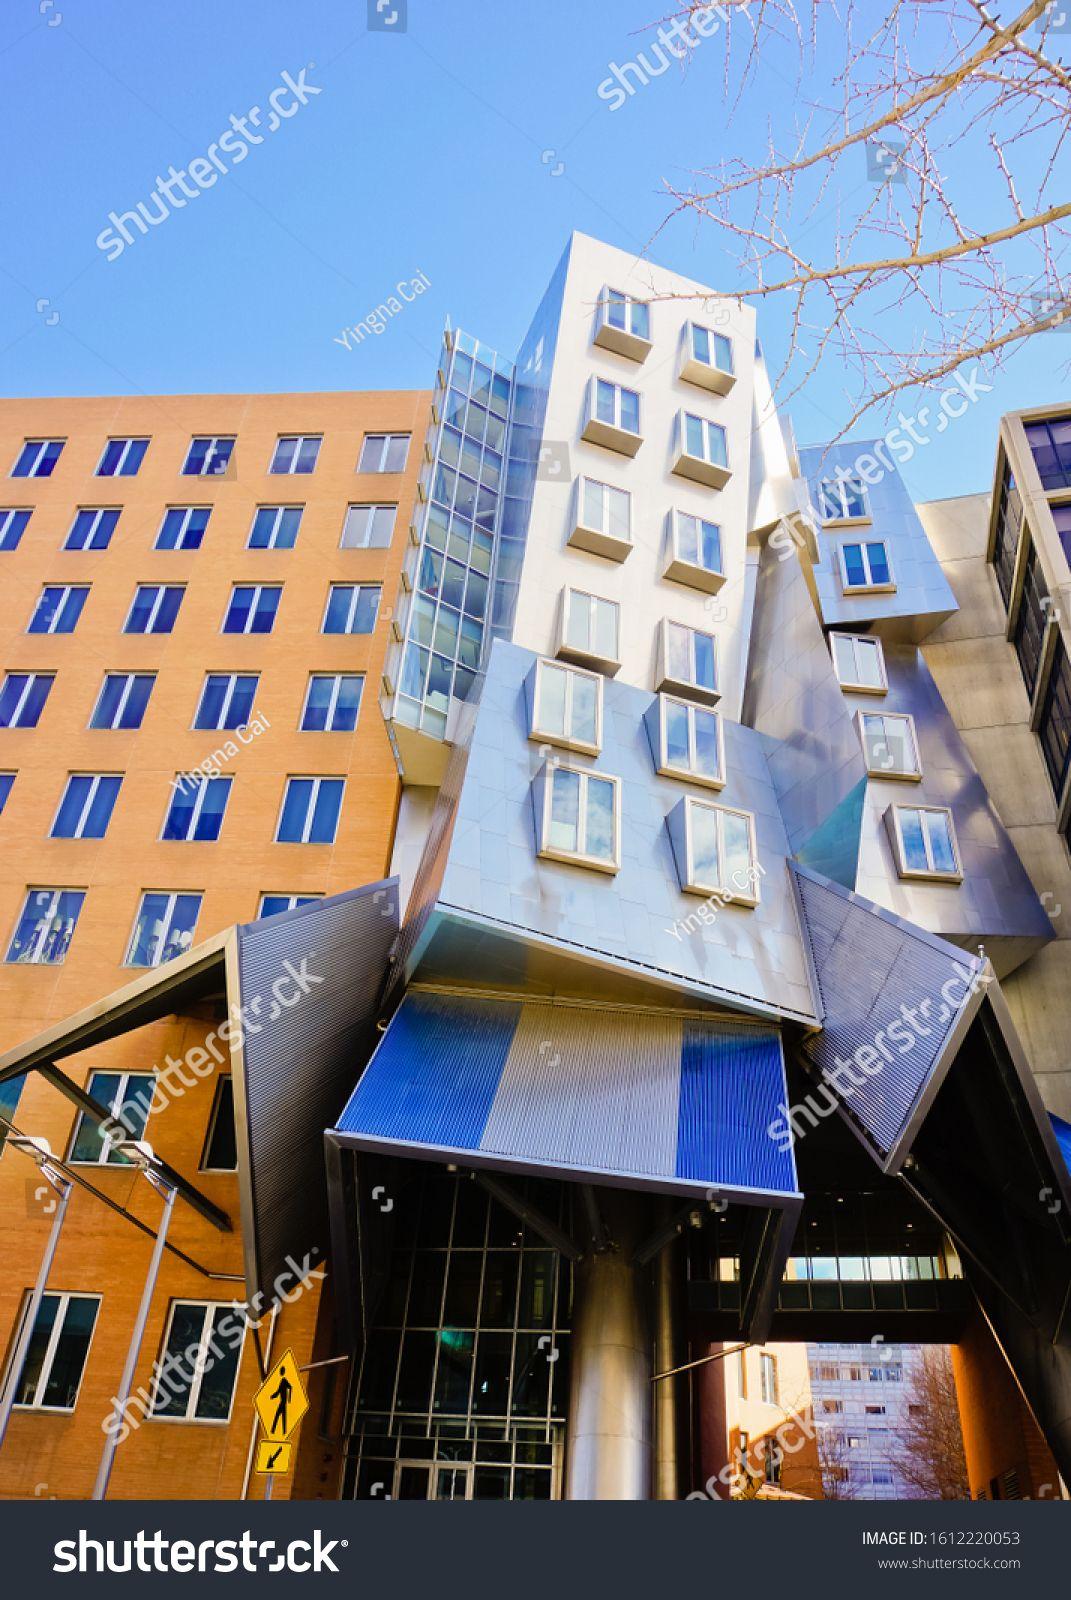 Cambridge Massachusetts U002funited States 3 U002f10 U002f2019 Tilted Buildings Of Ray And Maria Stat In 2020 Graphic Design Tutorials Diy Building Design Tutorials